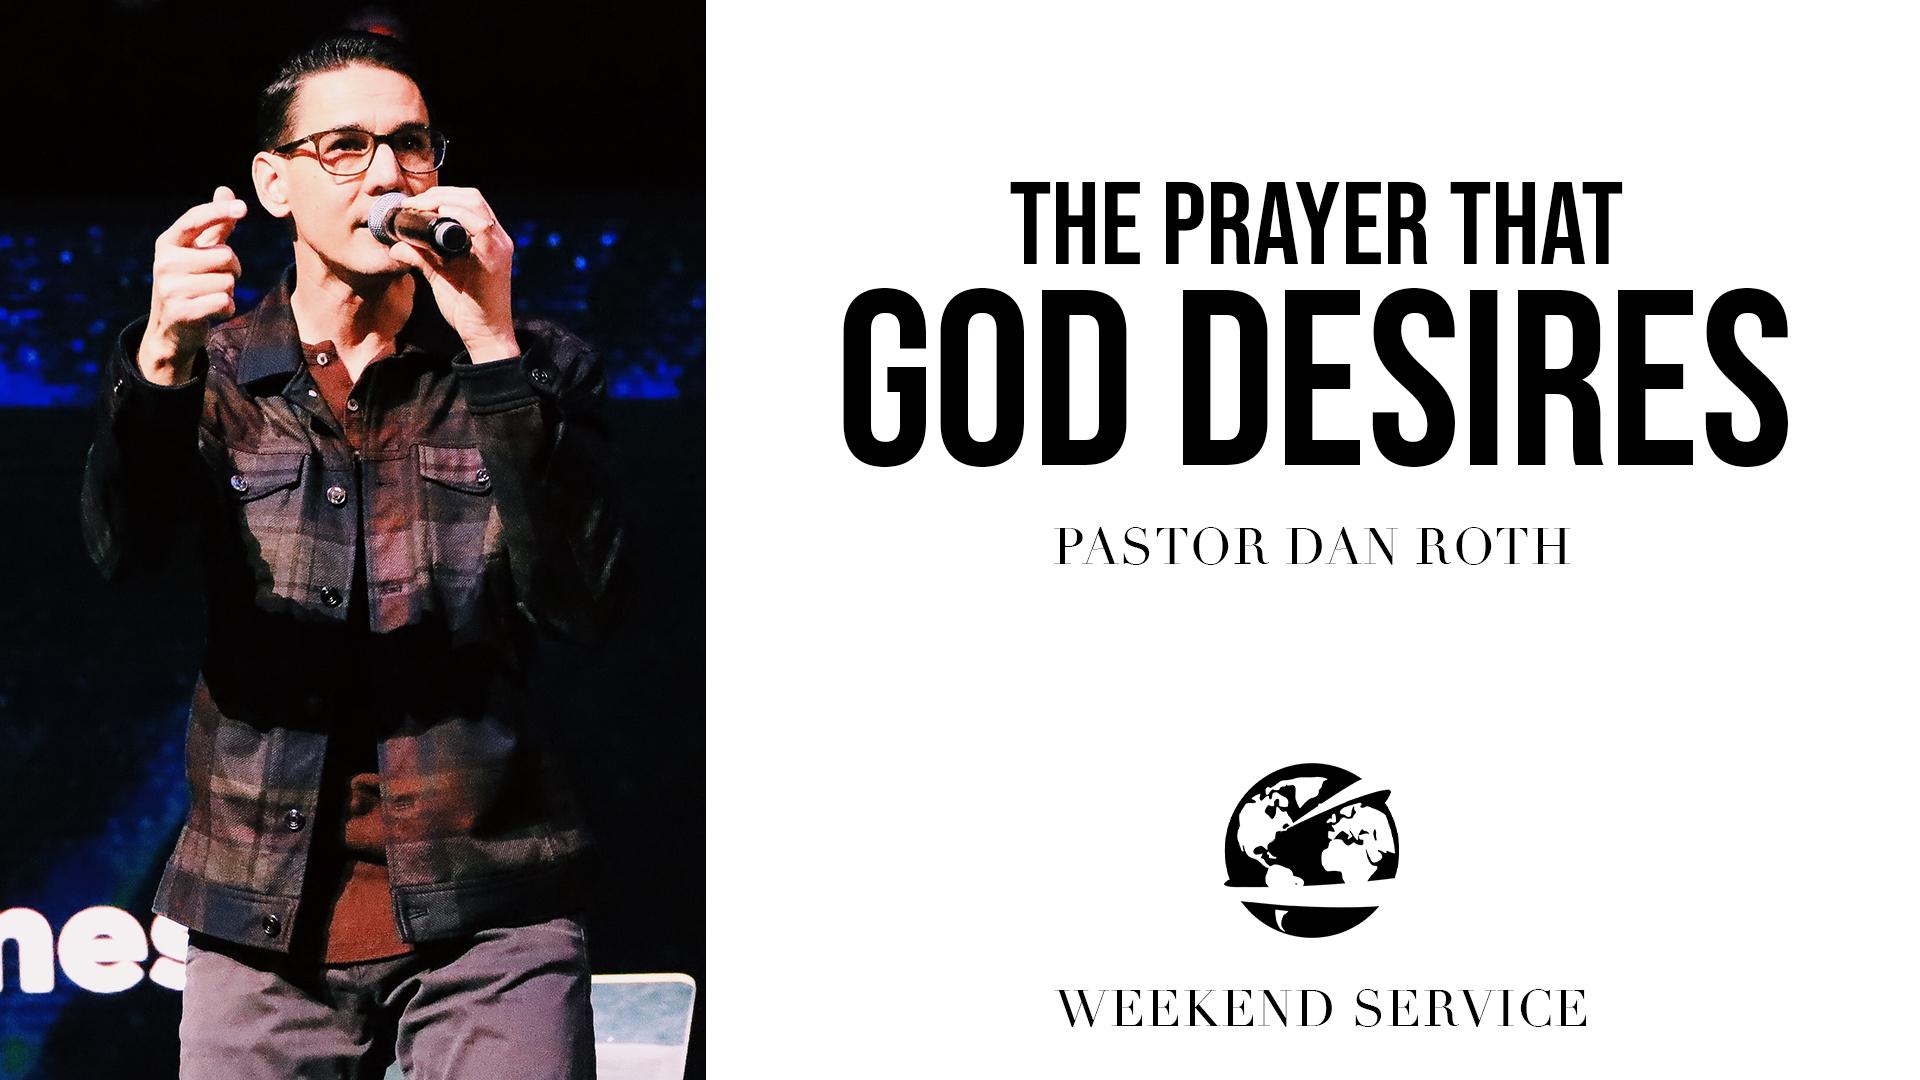 Watch The Prayer That God Desires Part 1